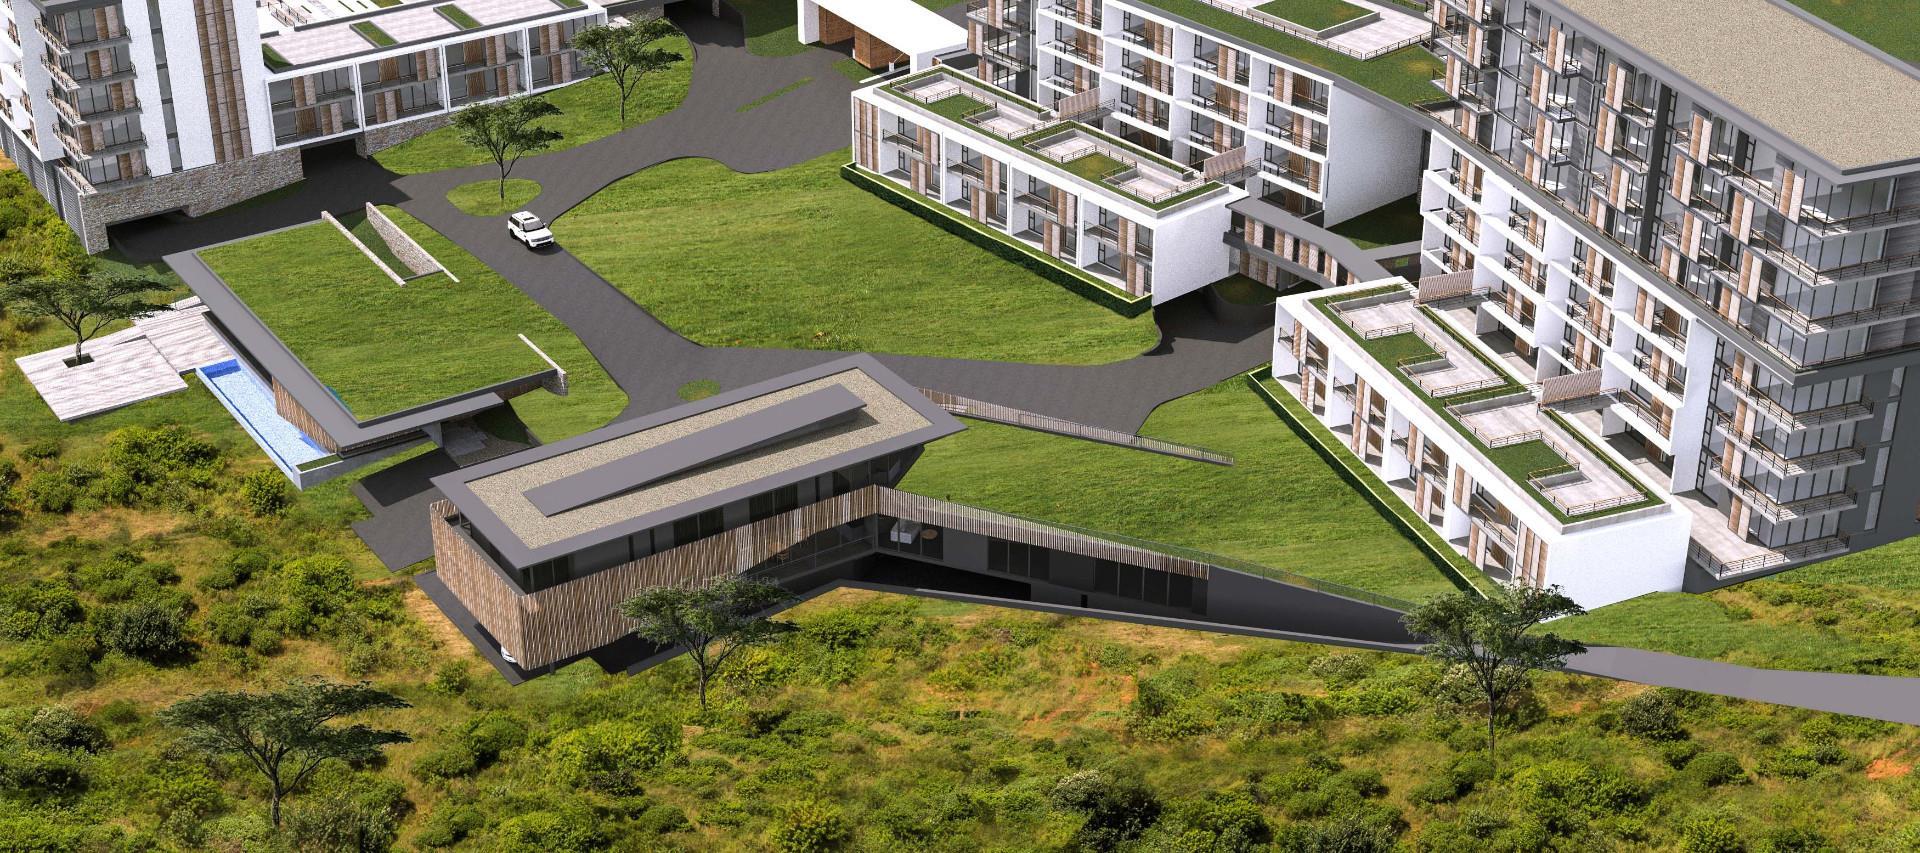 3 Bedroom Apartment / Flat For Sale in Sibaya Precinct